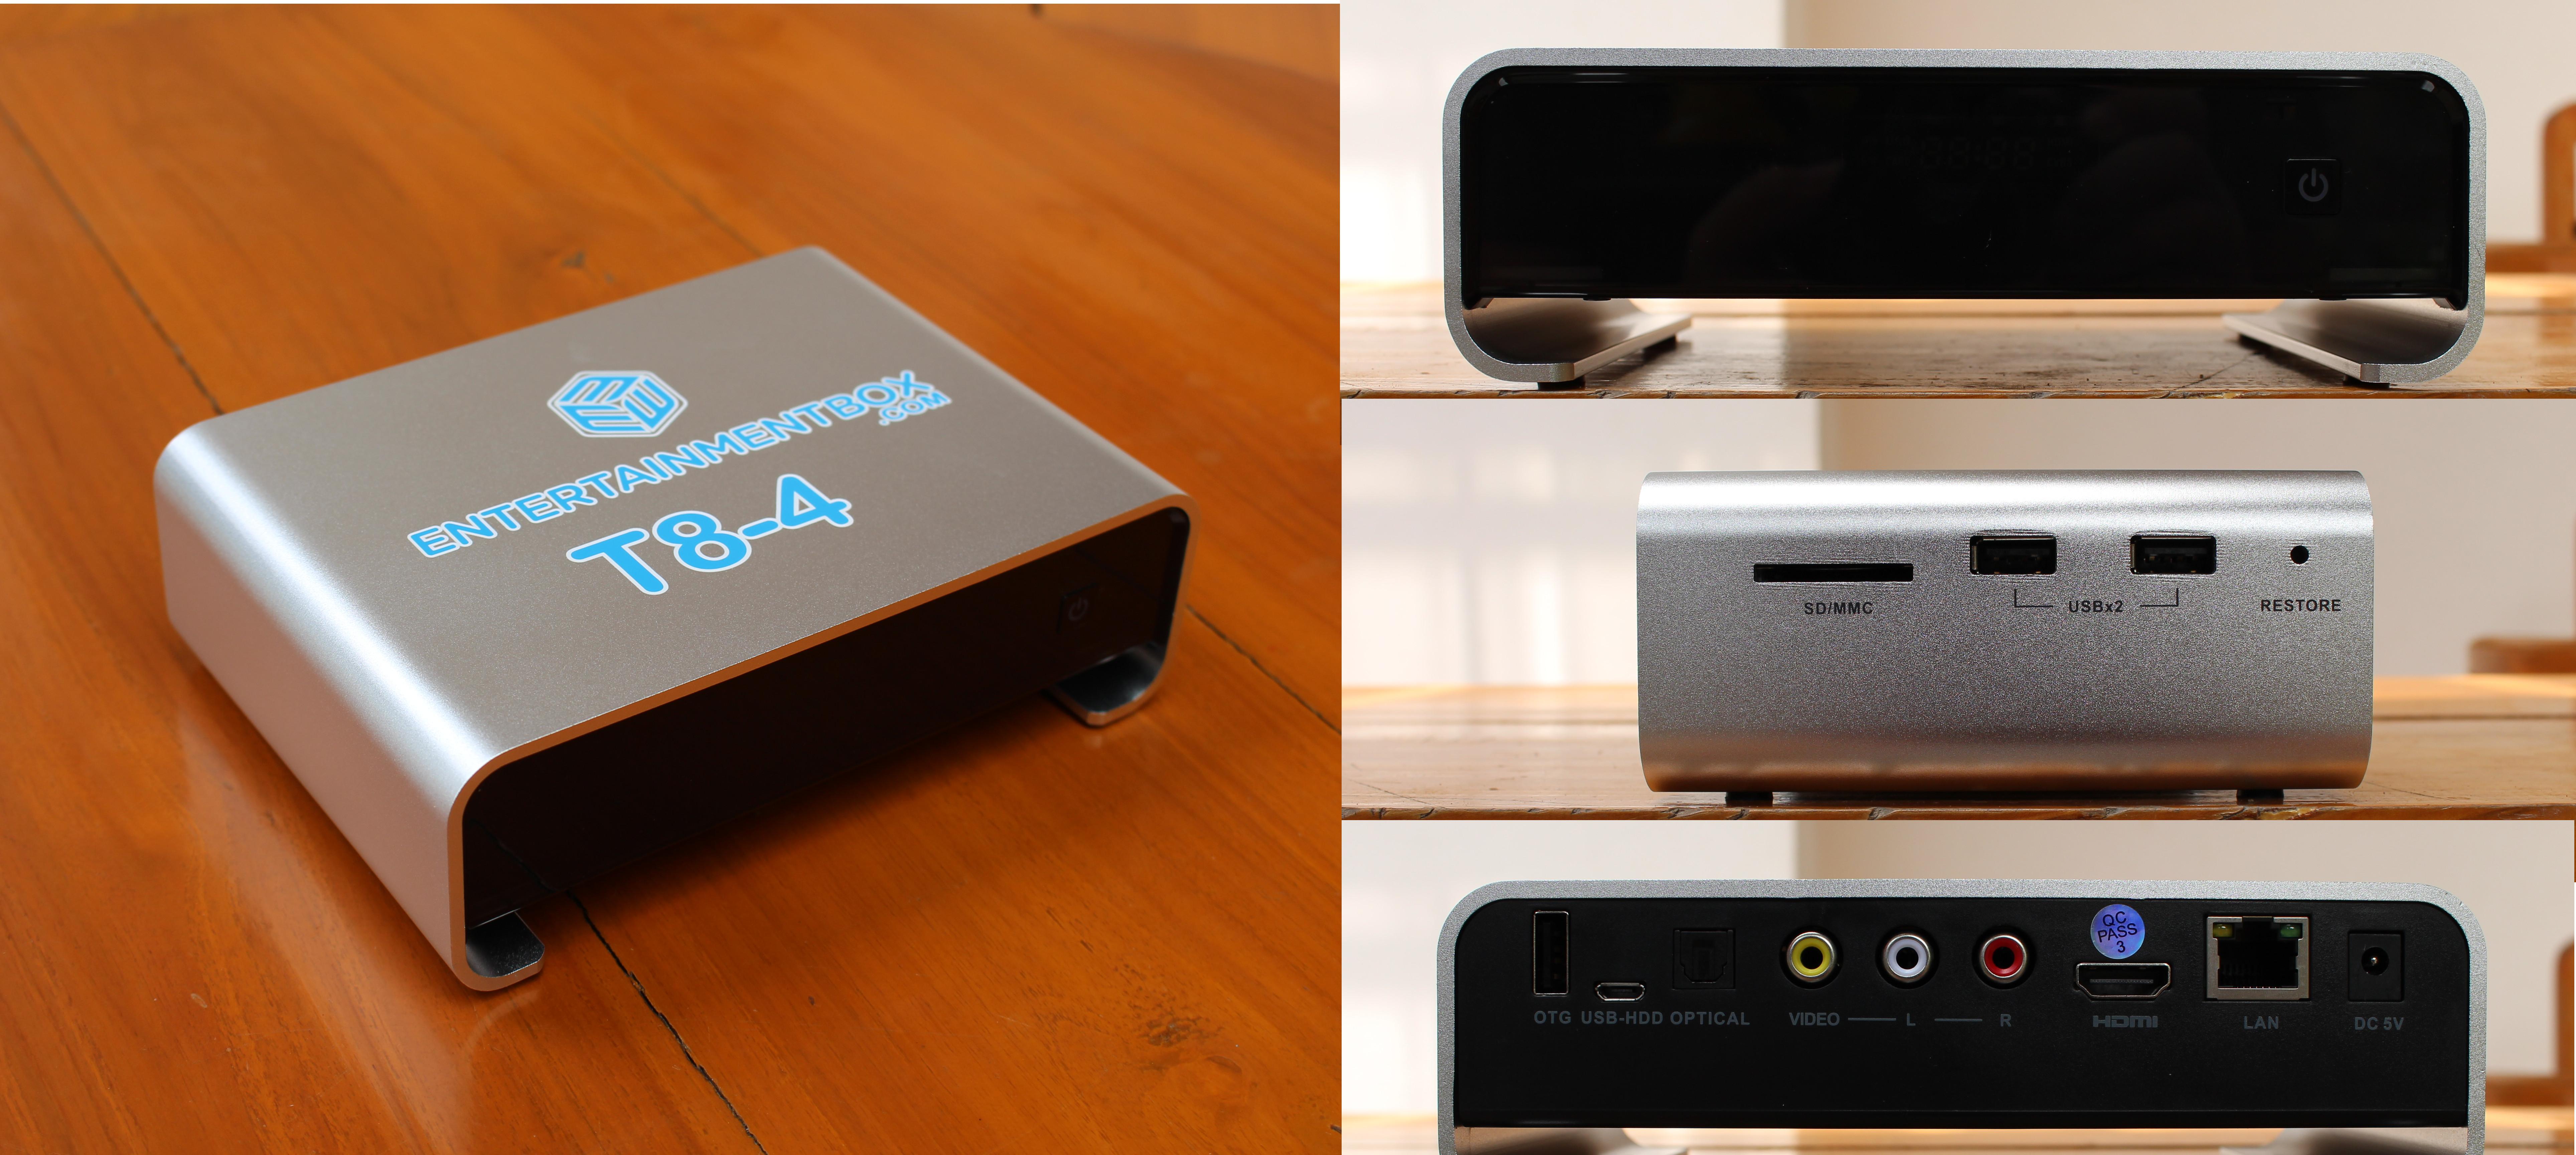 EBox T8-4 TV Box and Ipega Bluetooth Game Controller